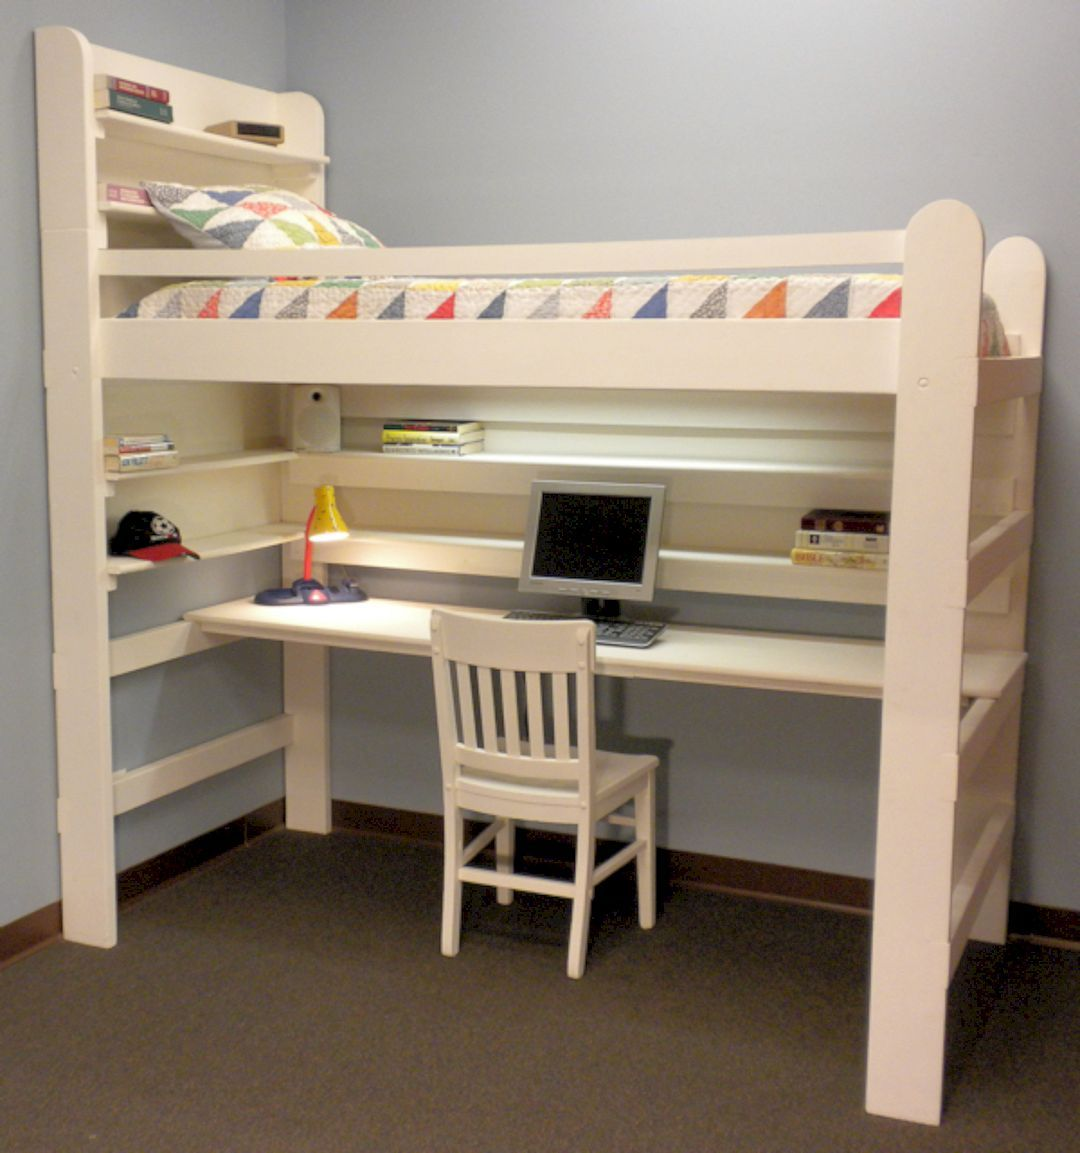 Kids Design Week 751 D Park Event And Exhibition Design Project By Crossboundaries Bunk Bed Designs Bunk Bed With Desk Loft Bed